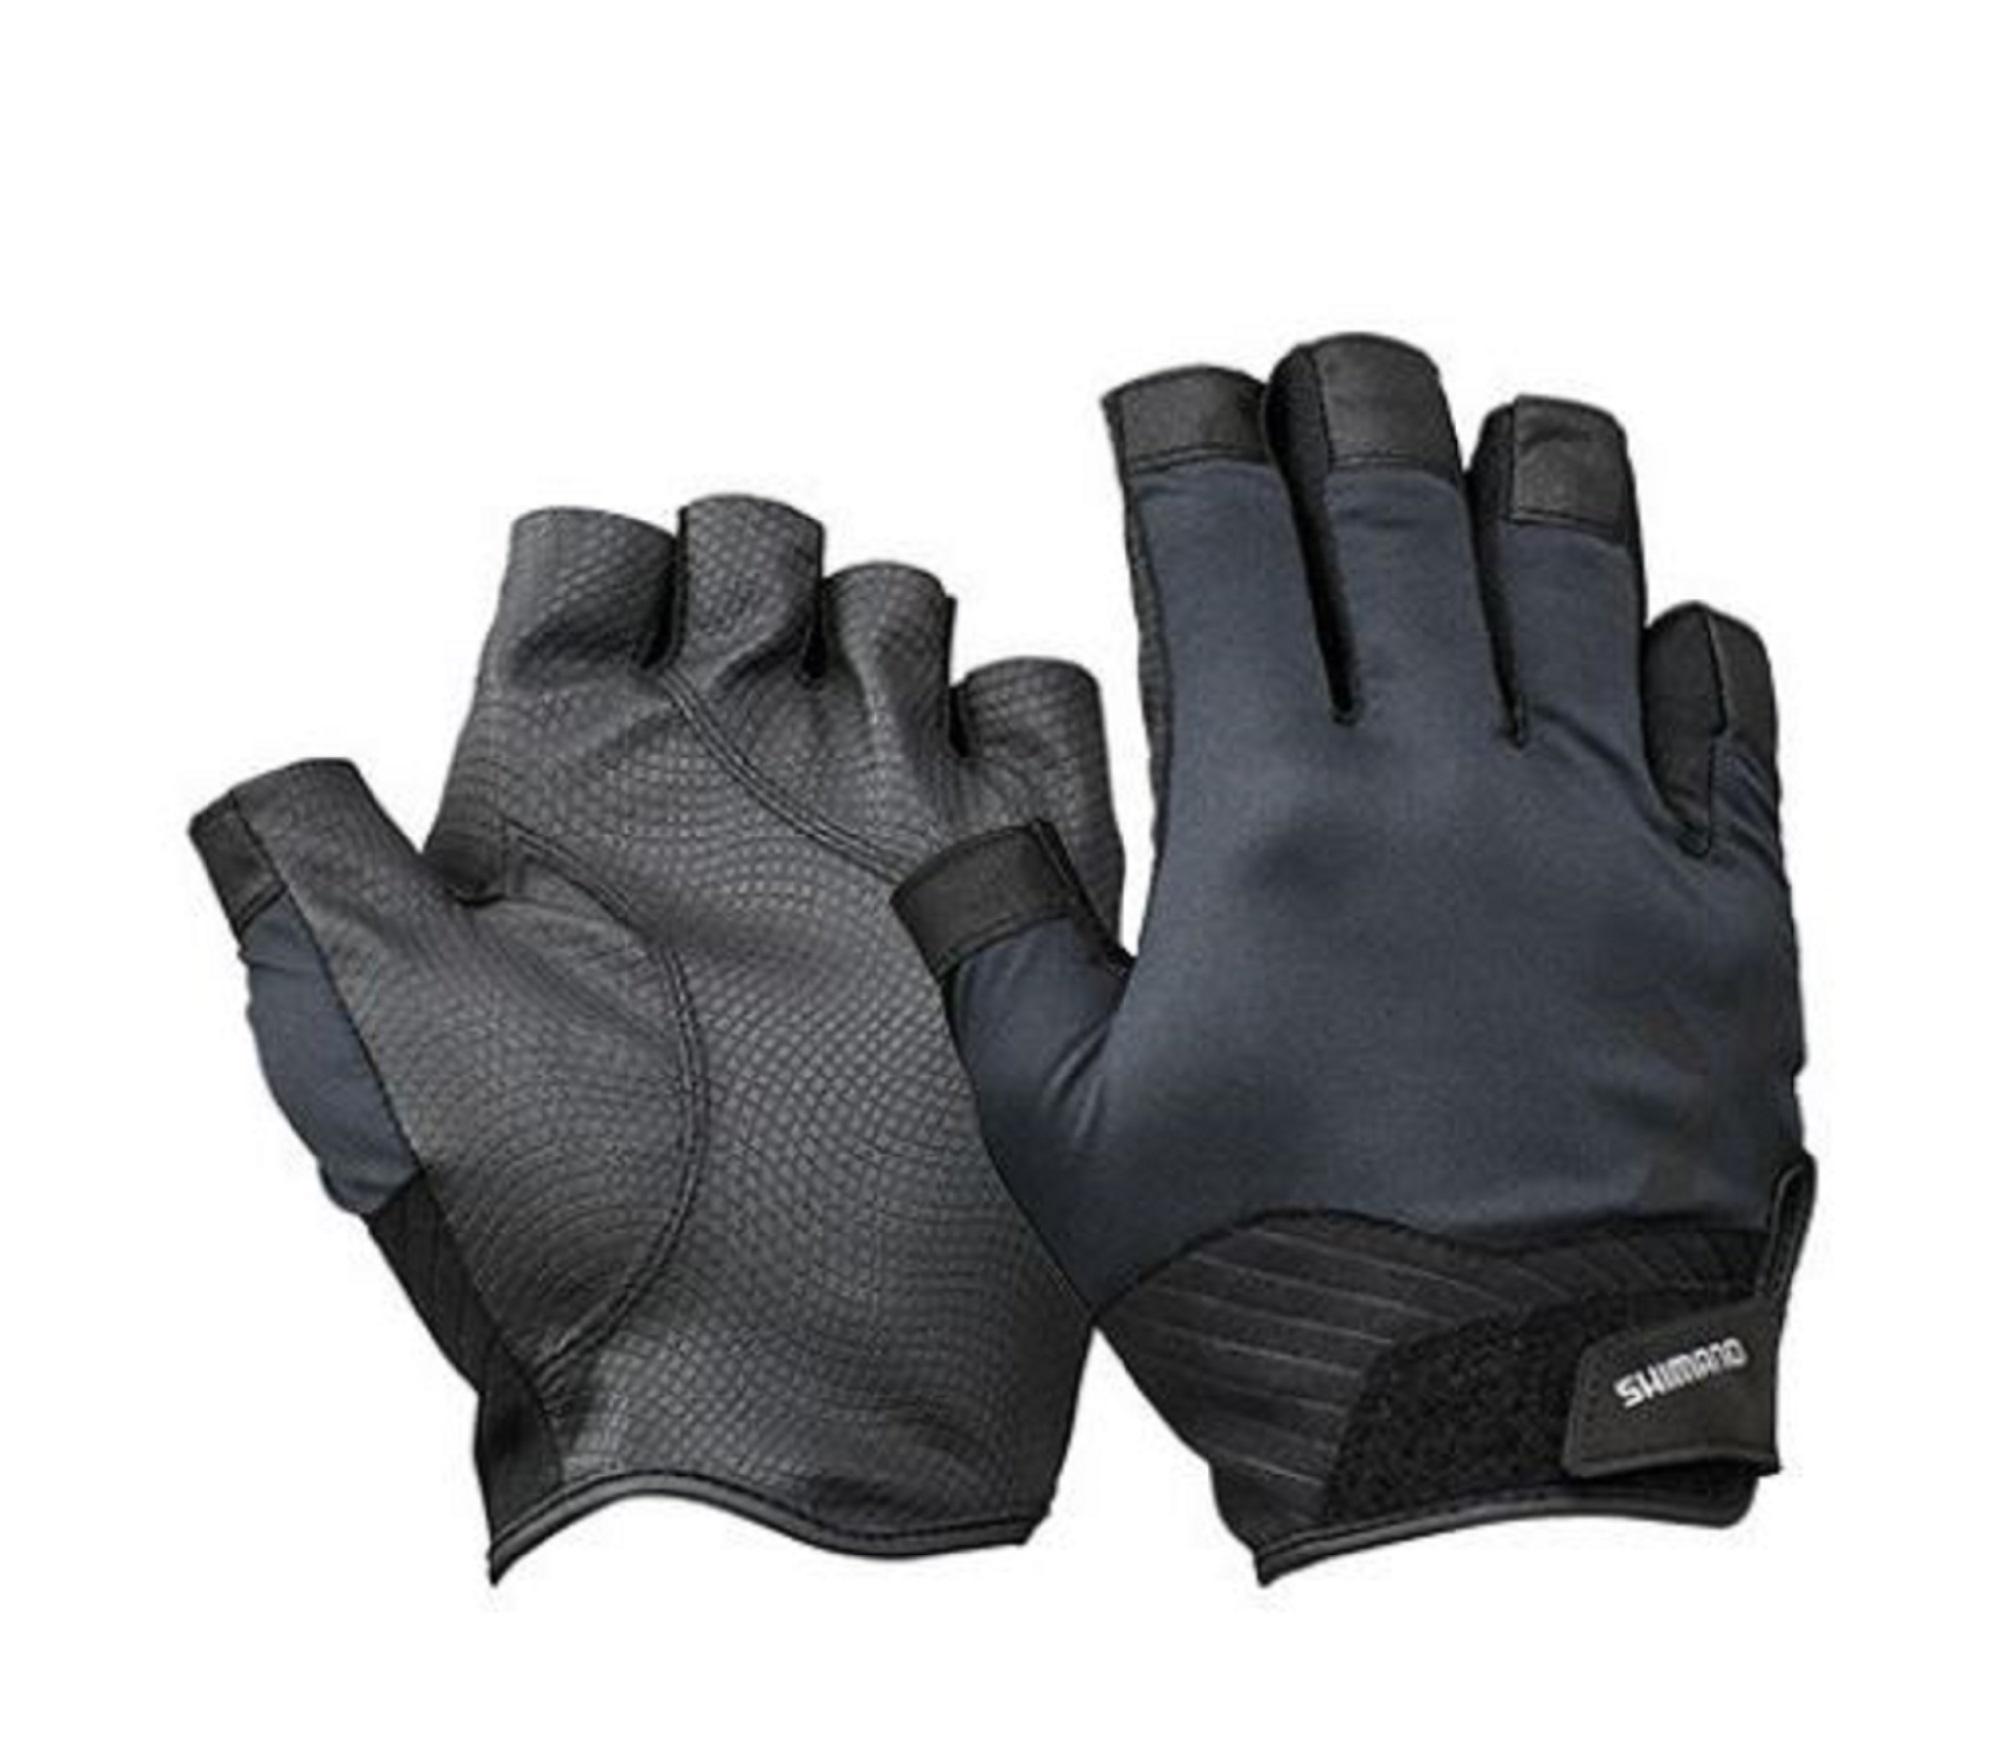 Shimano GL-222T Gloves Rungun 5 Fingerless Black Size XL 670243